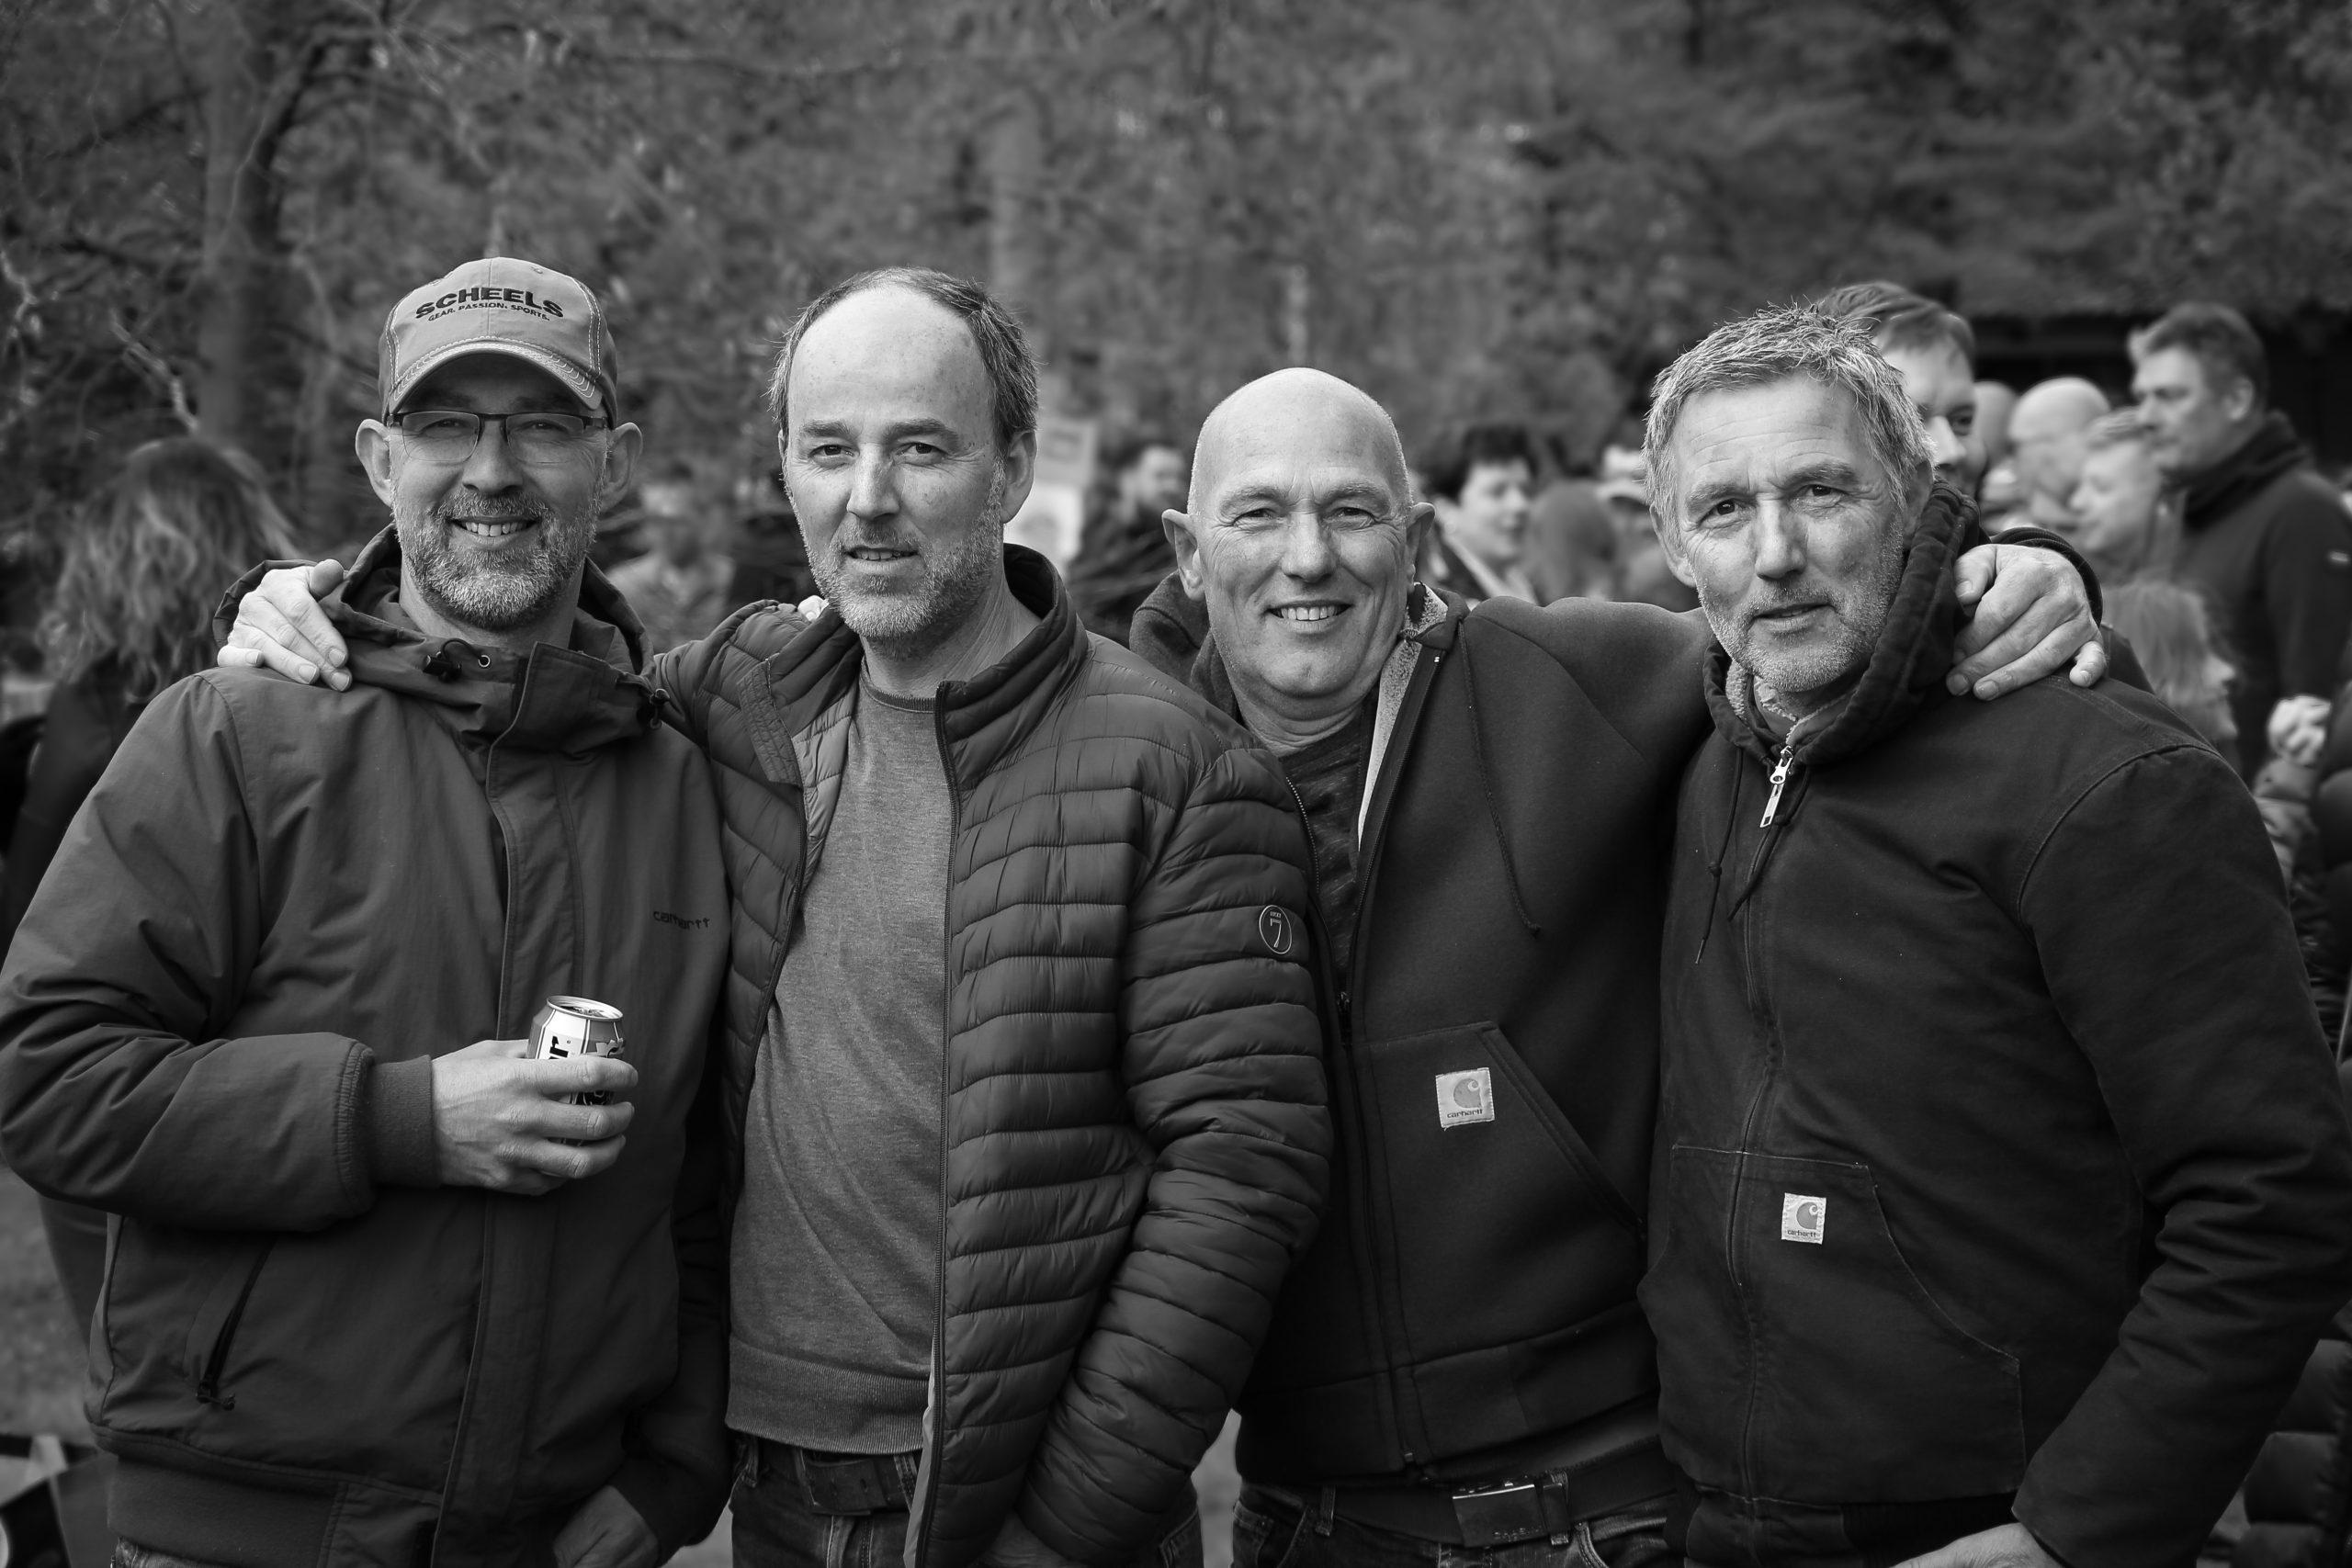 Marcel, Eduard, Peter & Richard